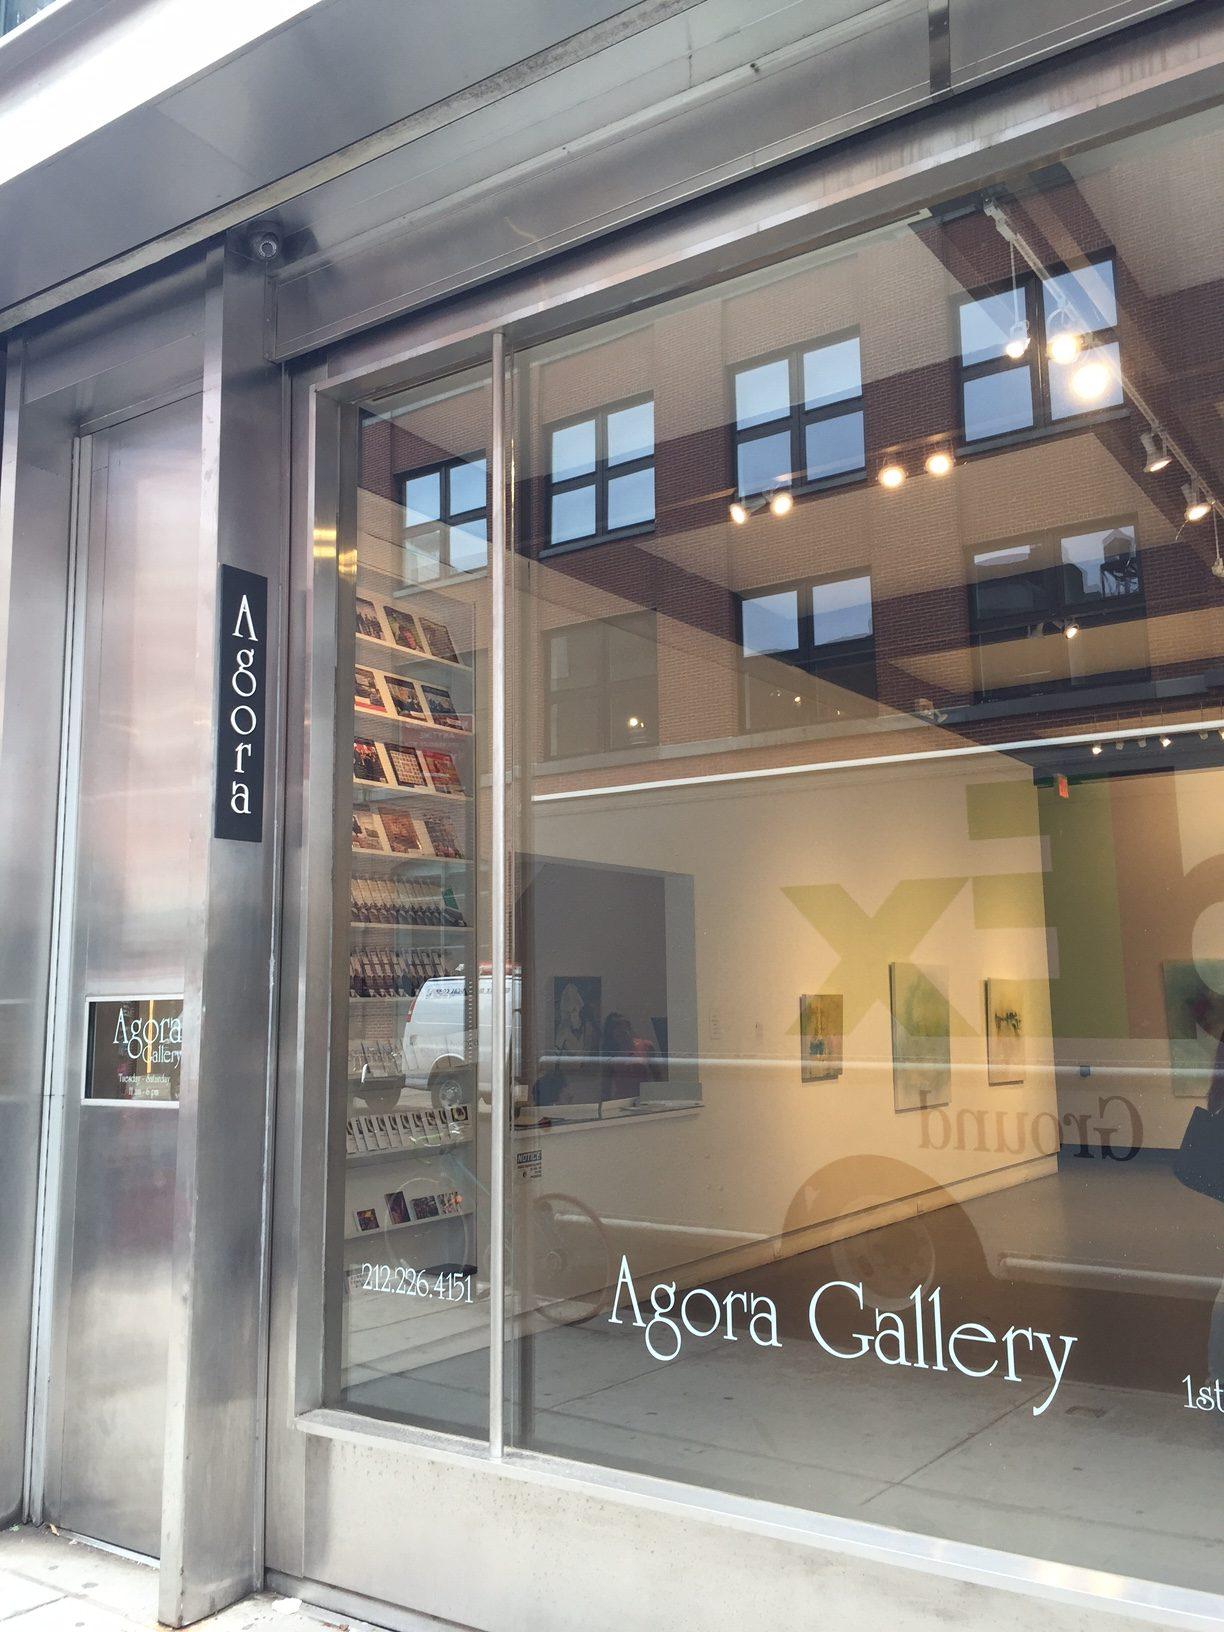 Agora Gallery New York 2016 1.jpg